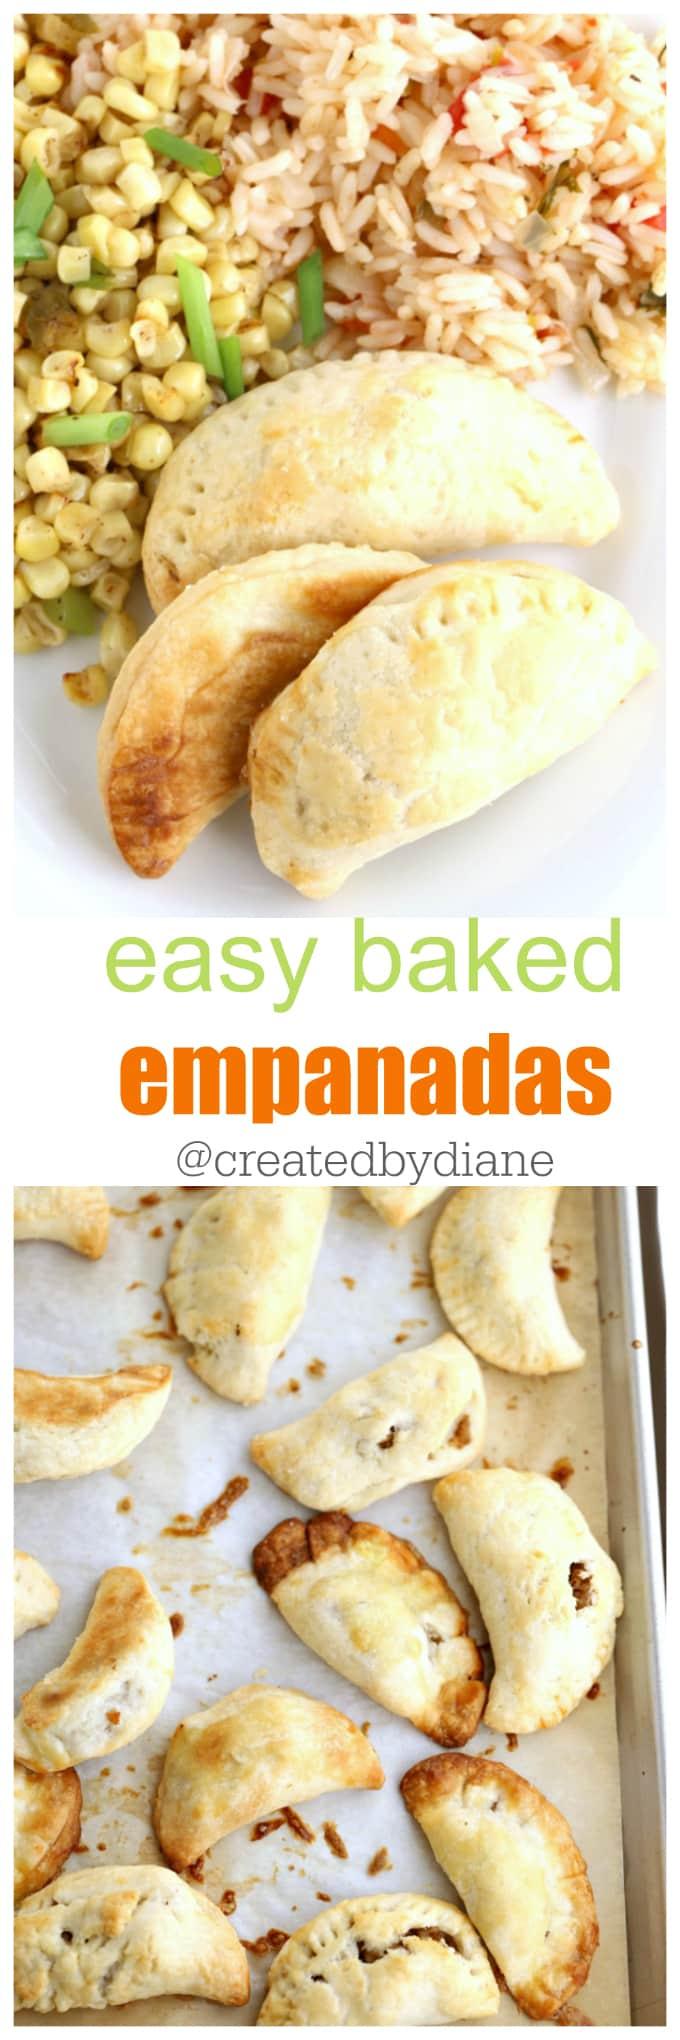 easy baked empanadas @createdbydiane